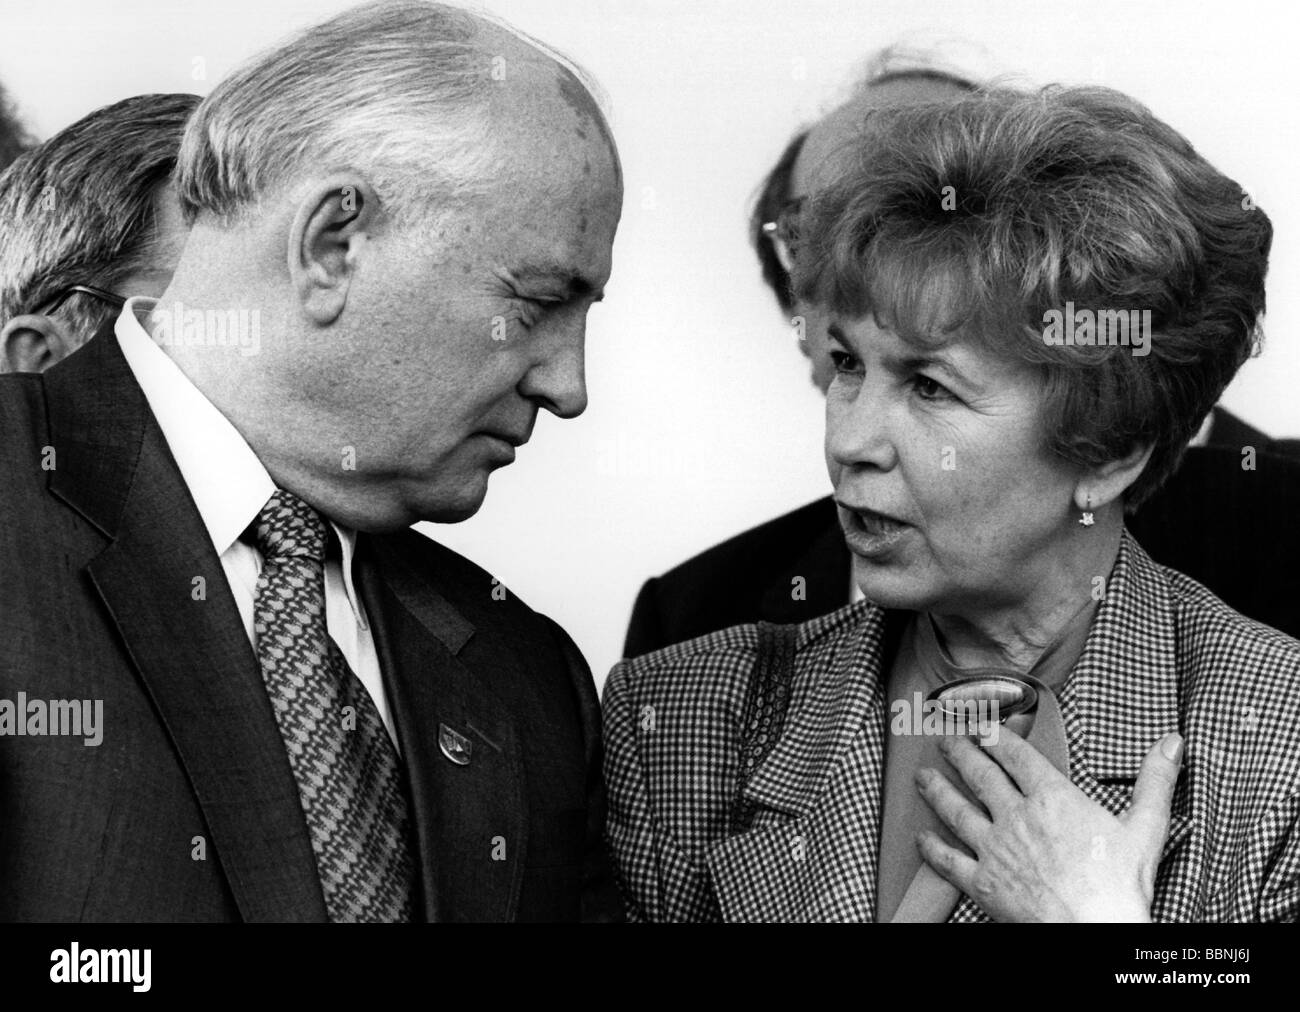 Raissa Gorbachev Banque d'image et photos - Alamy